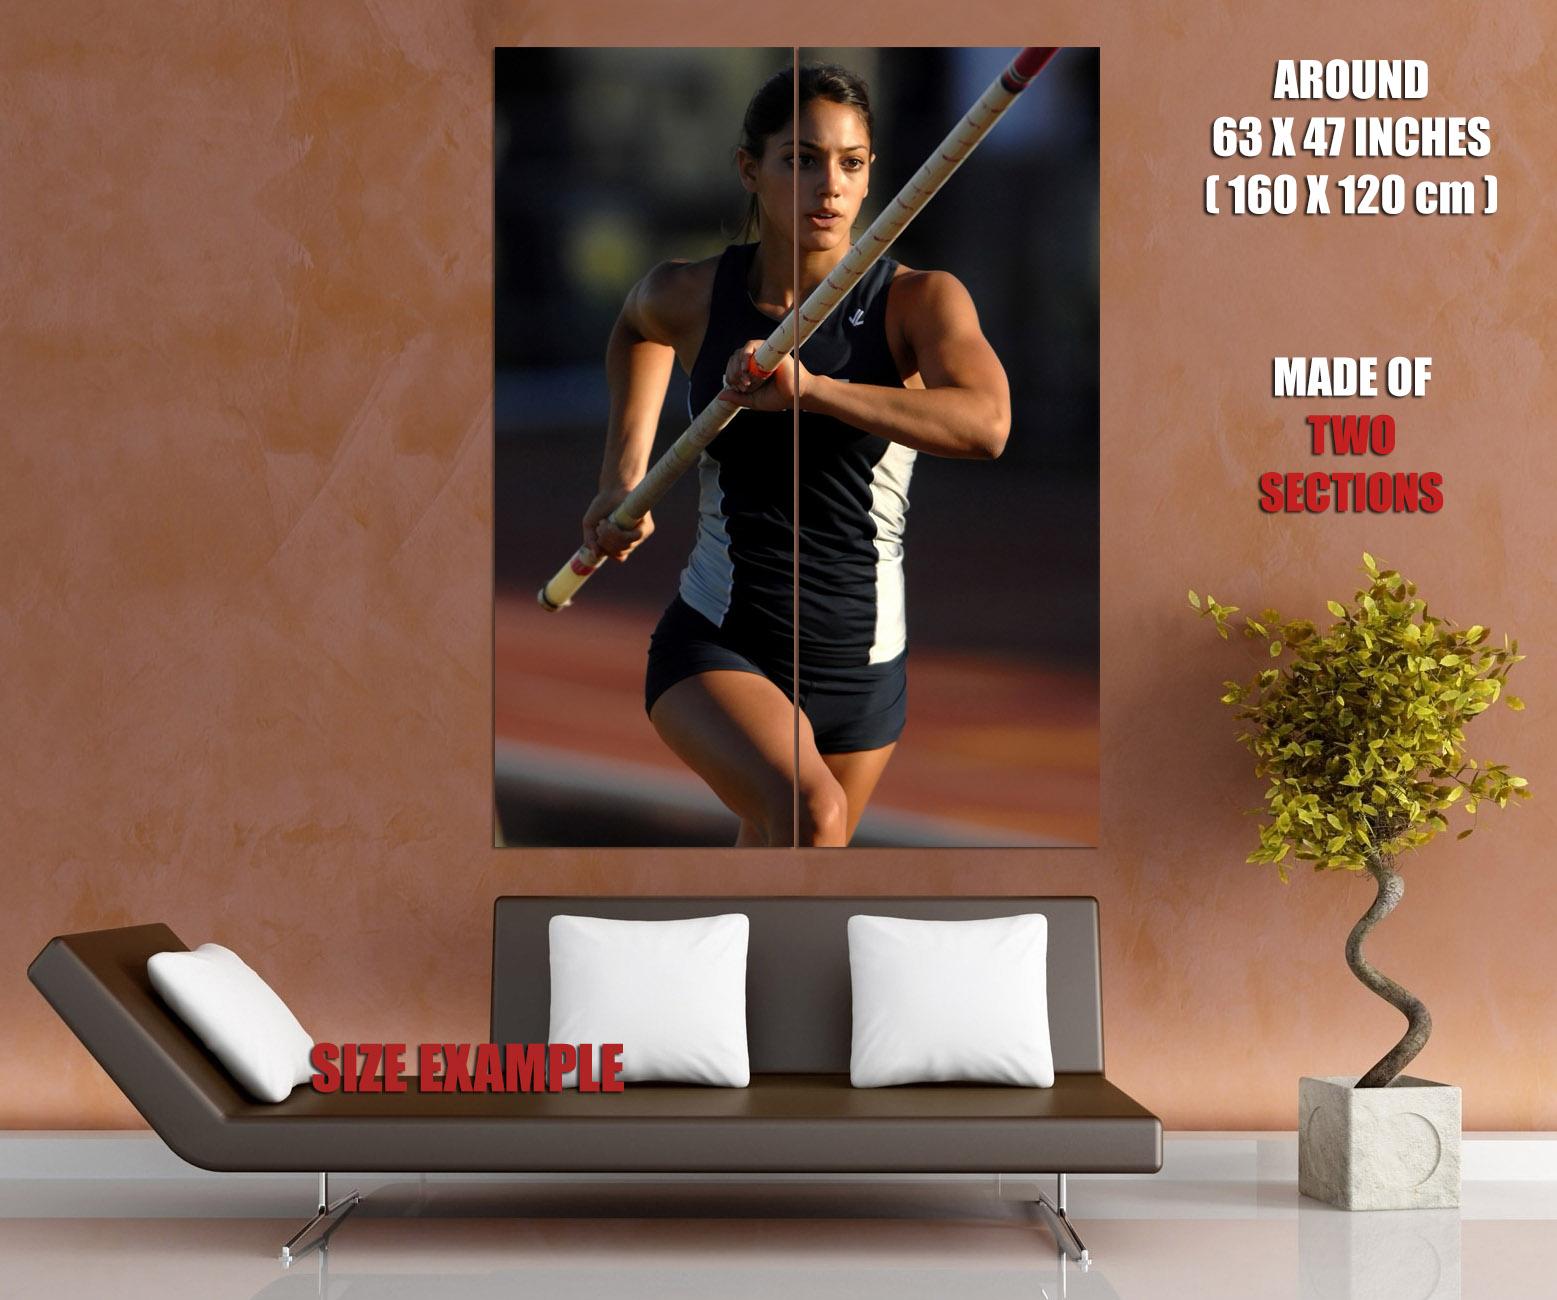 C4925-Allison-Stokke-Hottest-Pole-vaulter-Wall-Print-POSTER-AU